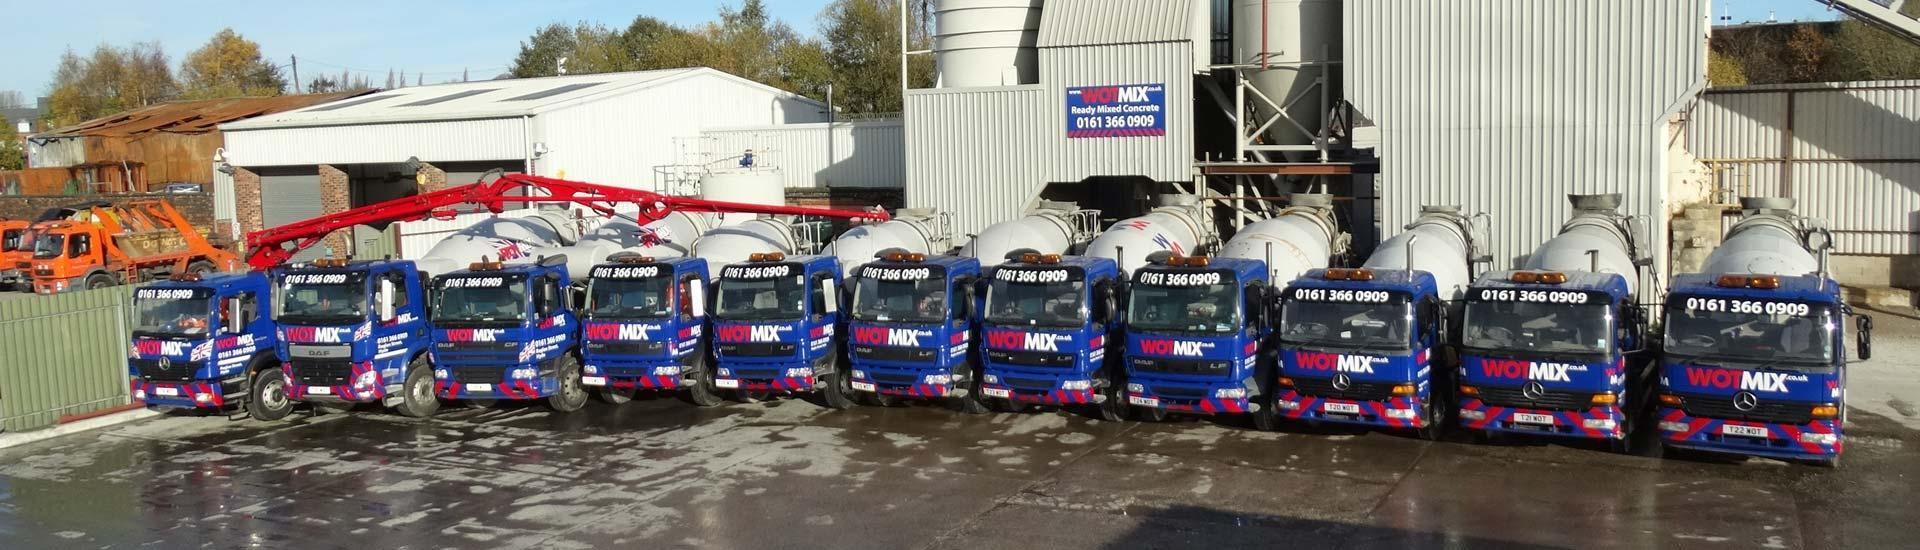 Ready Mixed Concrete Manchester